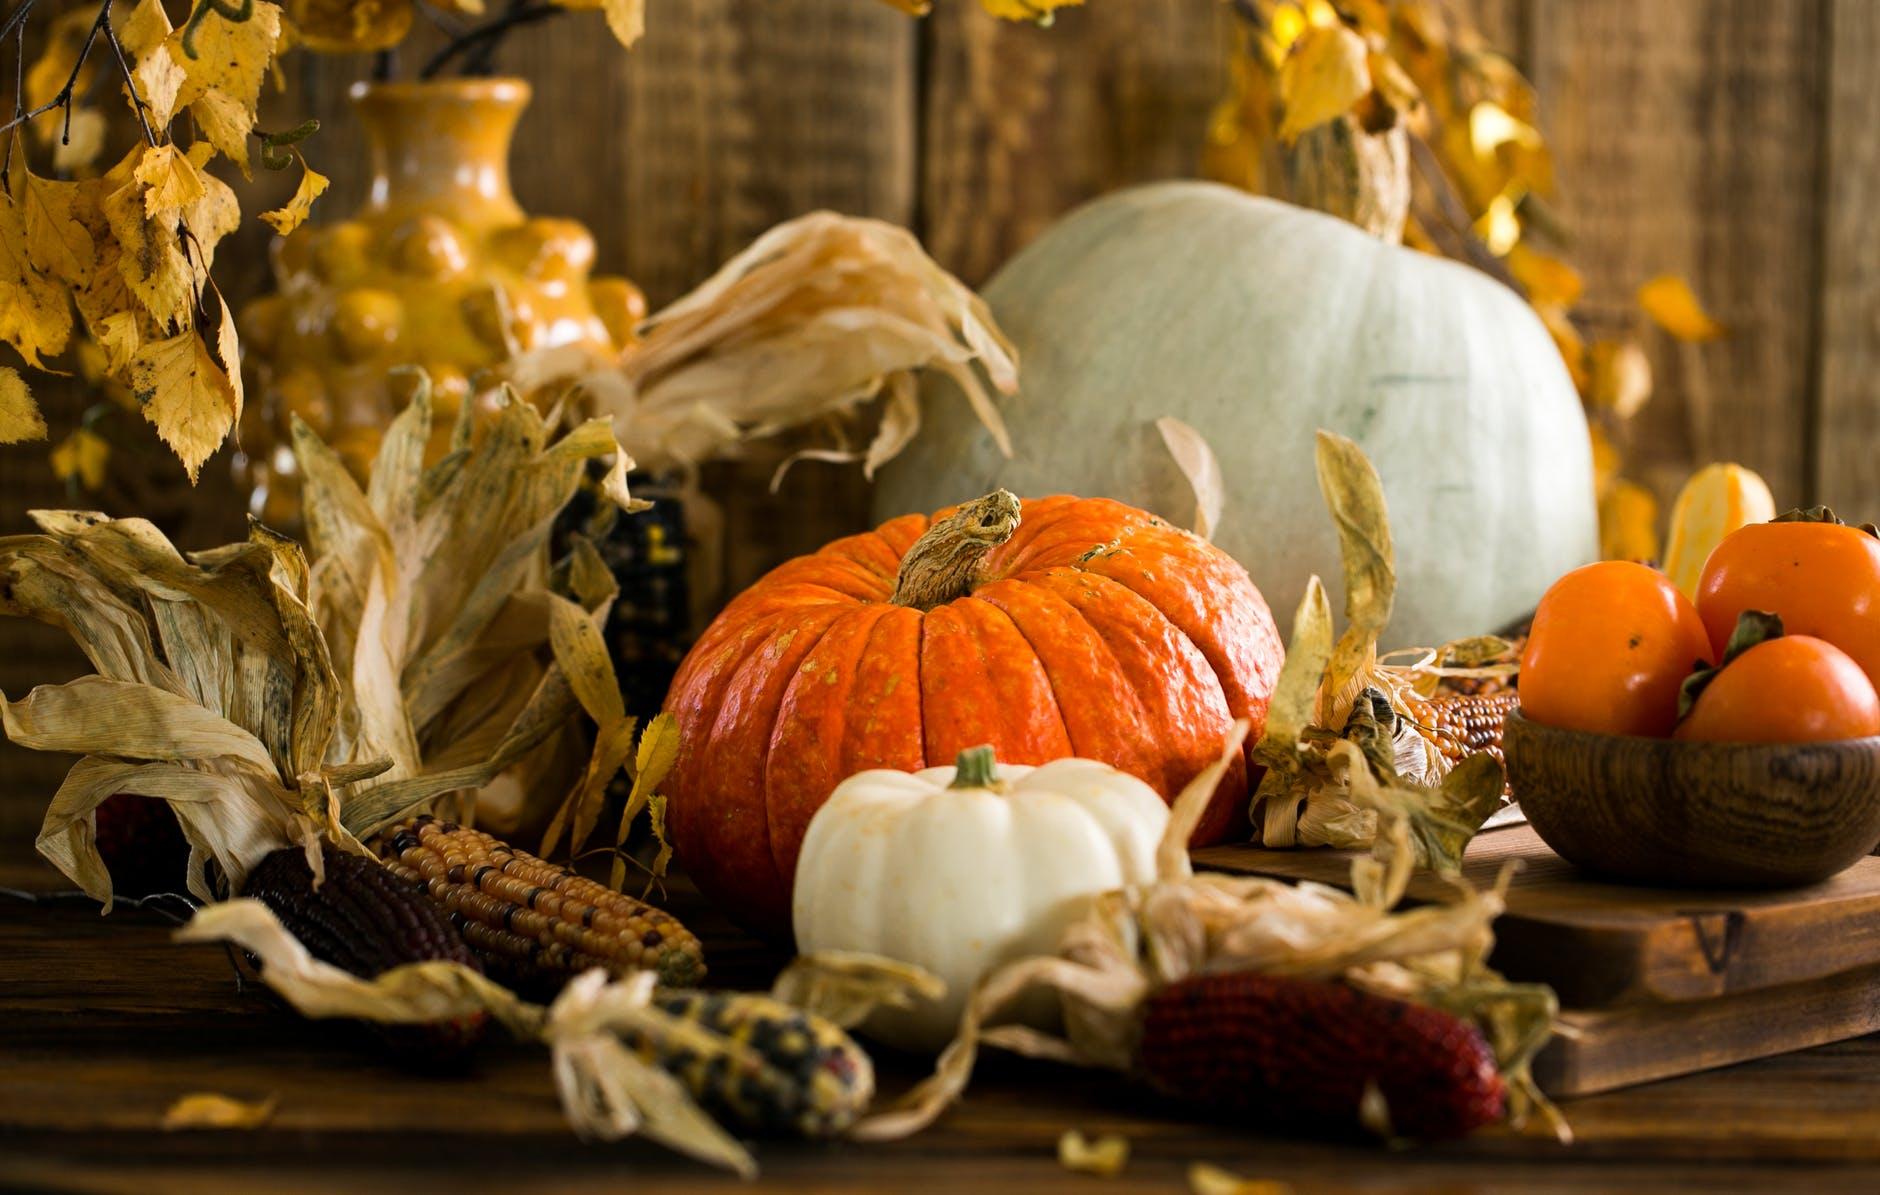 Gourd harvest – Photo by Anna Tukhfatullina Food Photographer/Stylist on Pexels.com